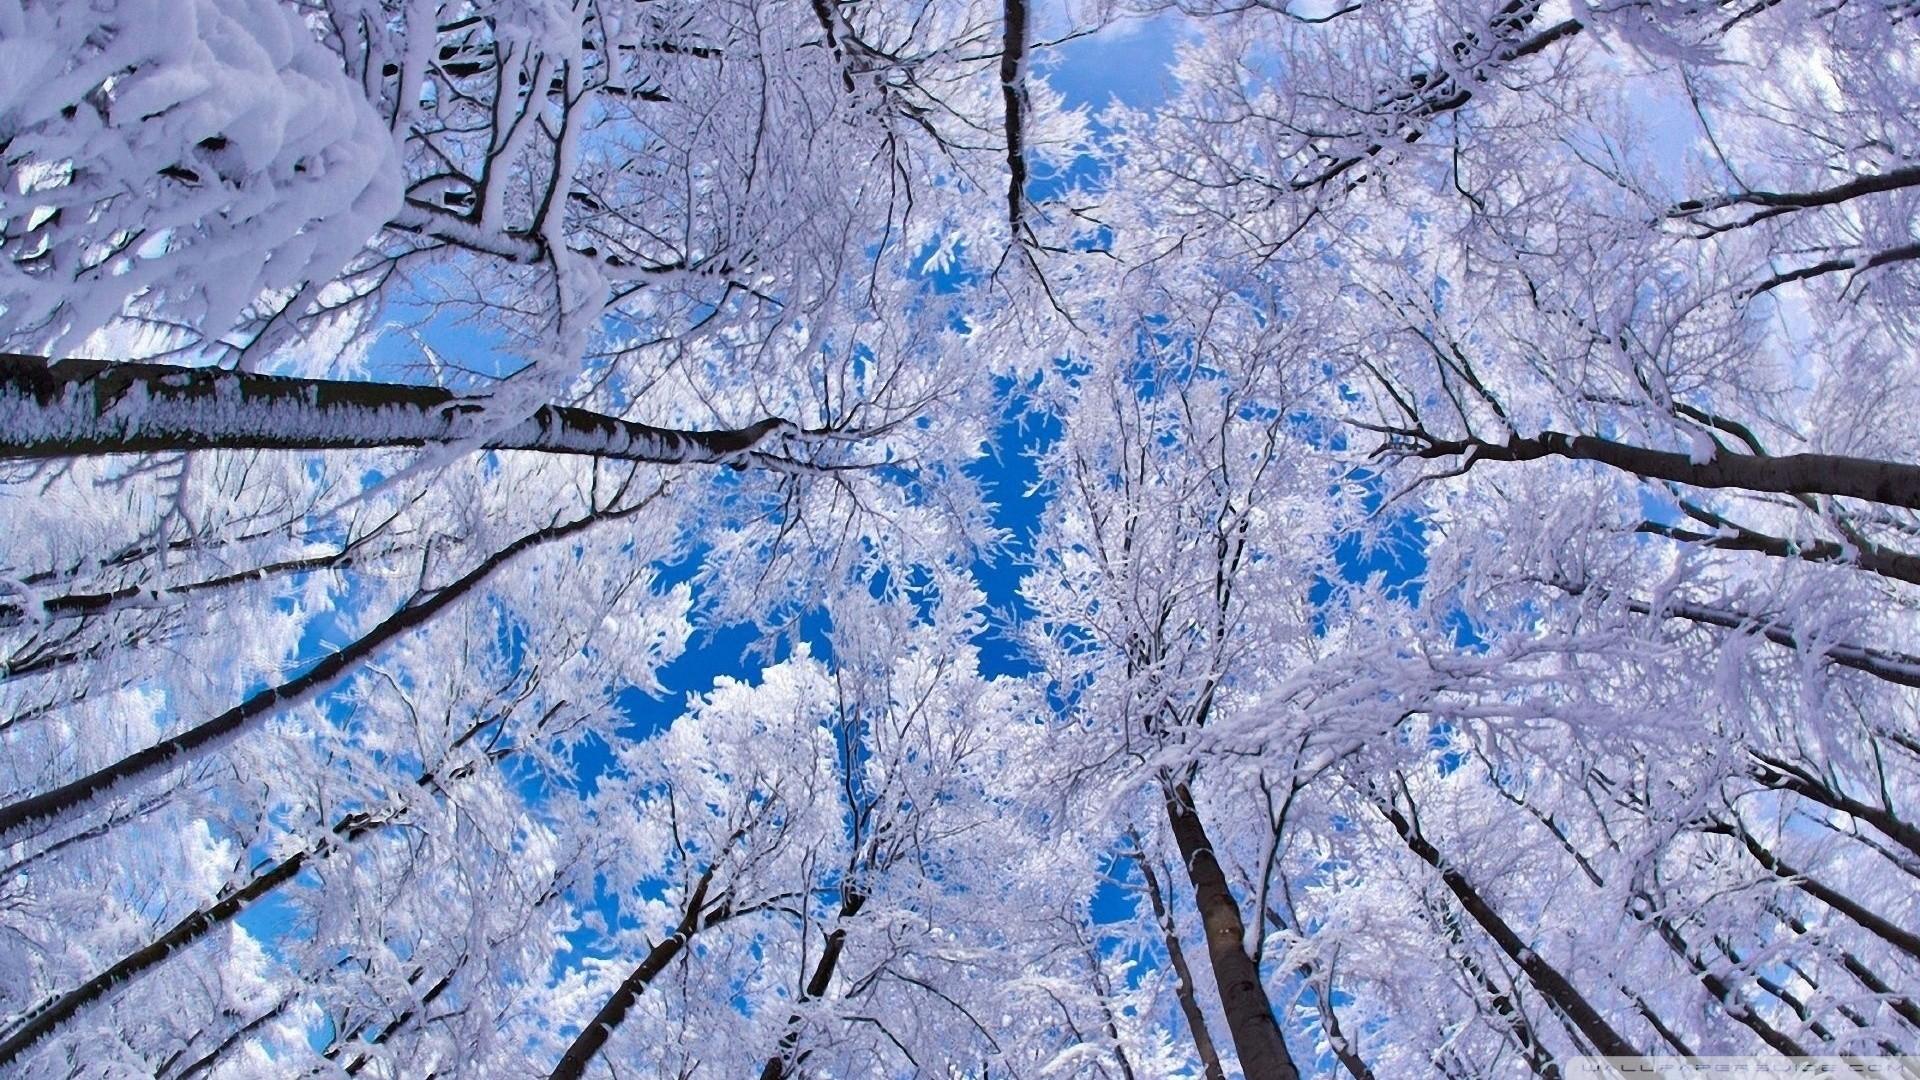 Snowfall Wallpaper Hd 1080p